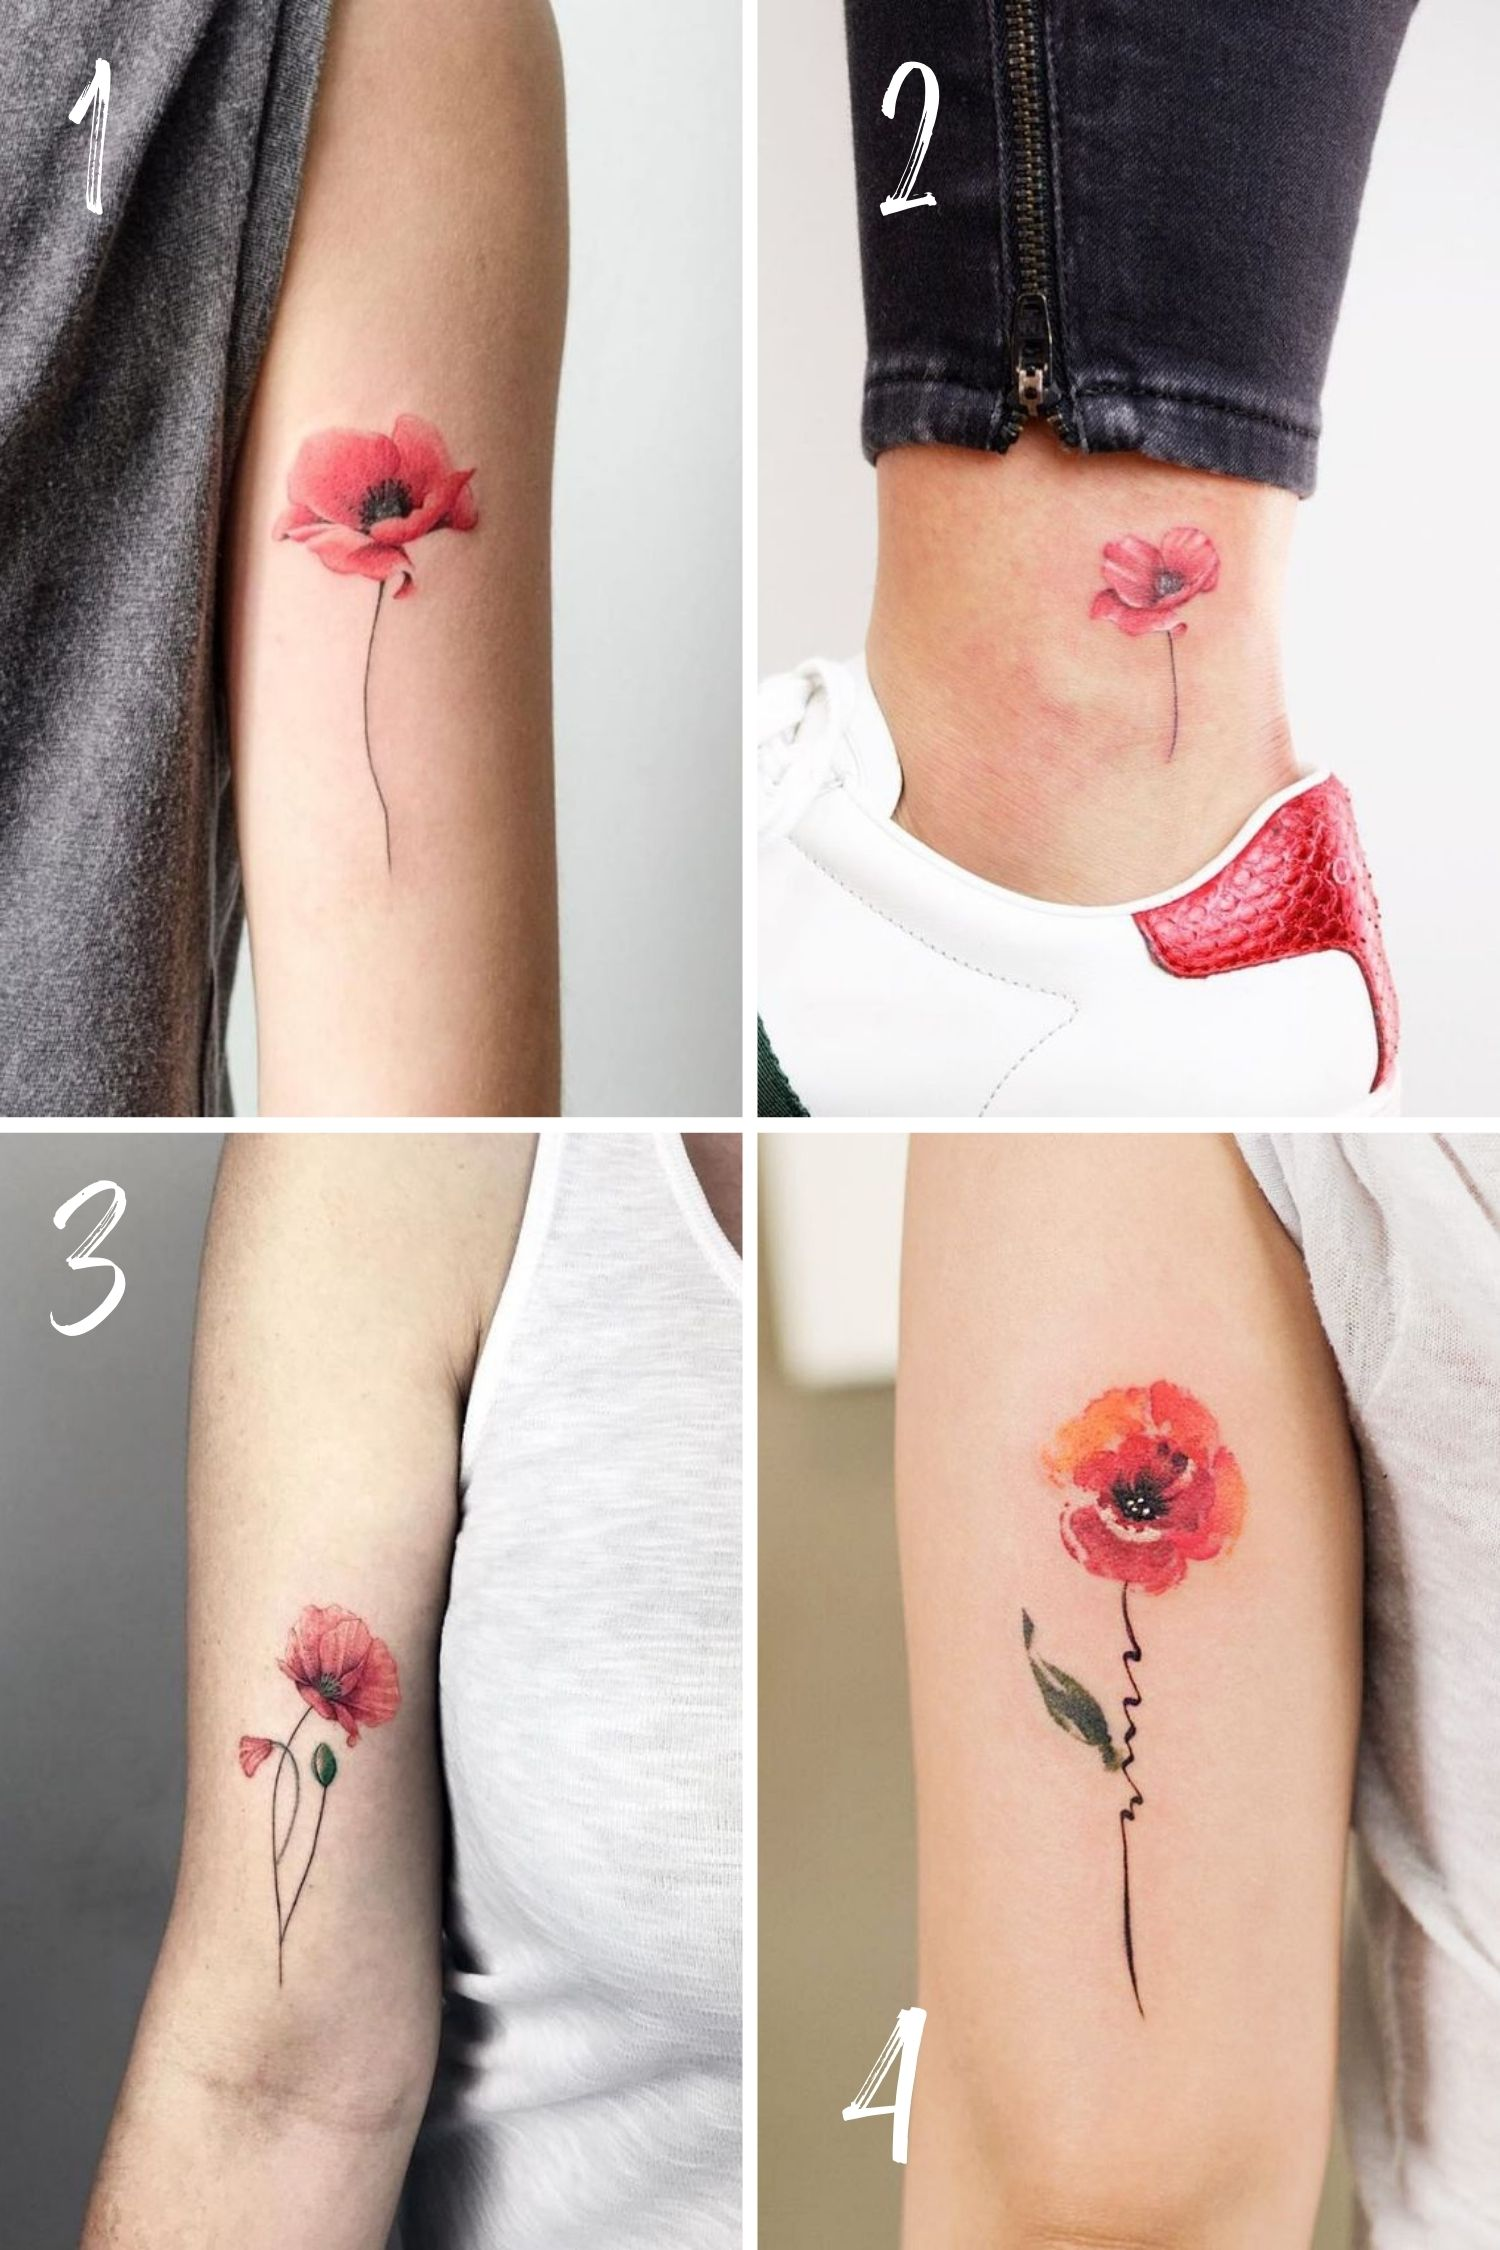 Red Poppy Flower Tattoos